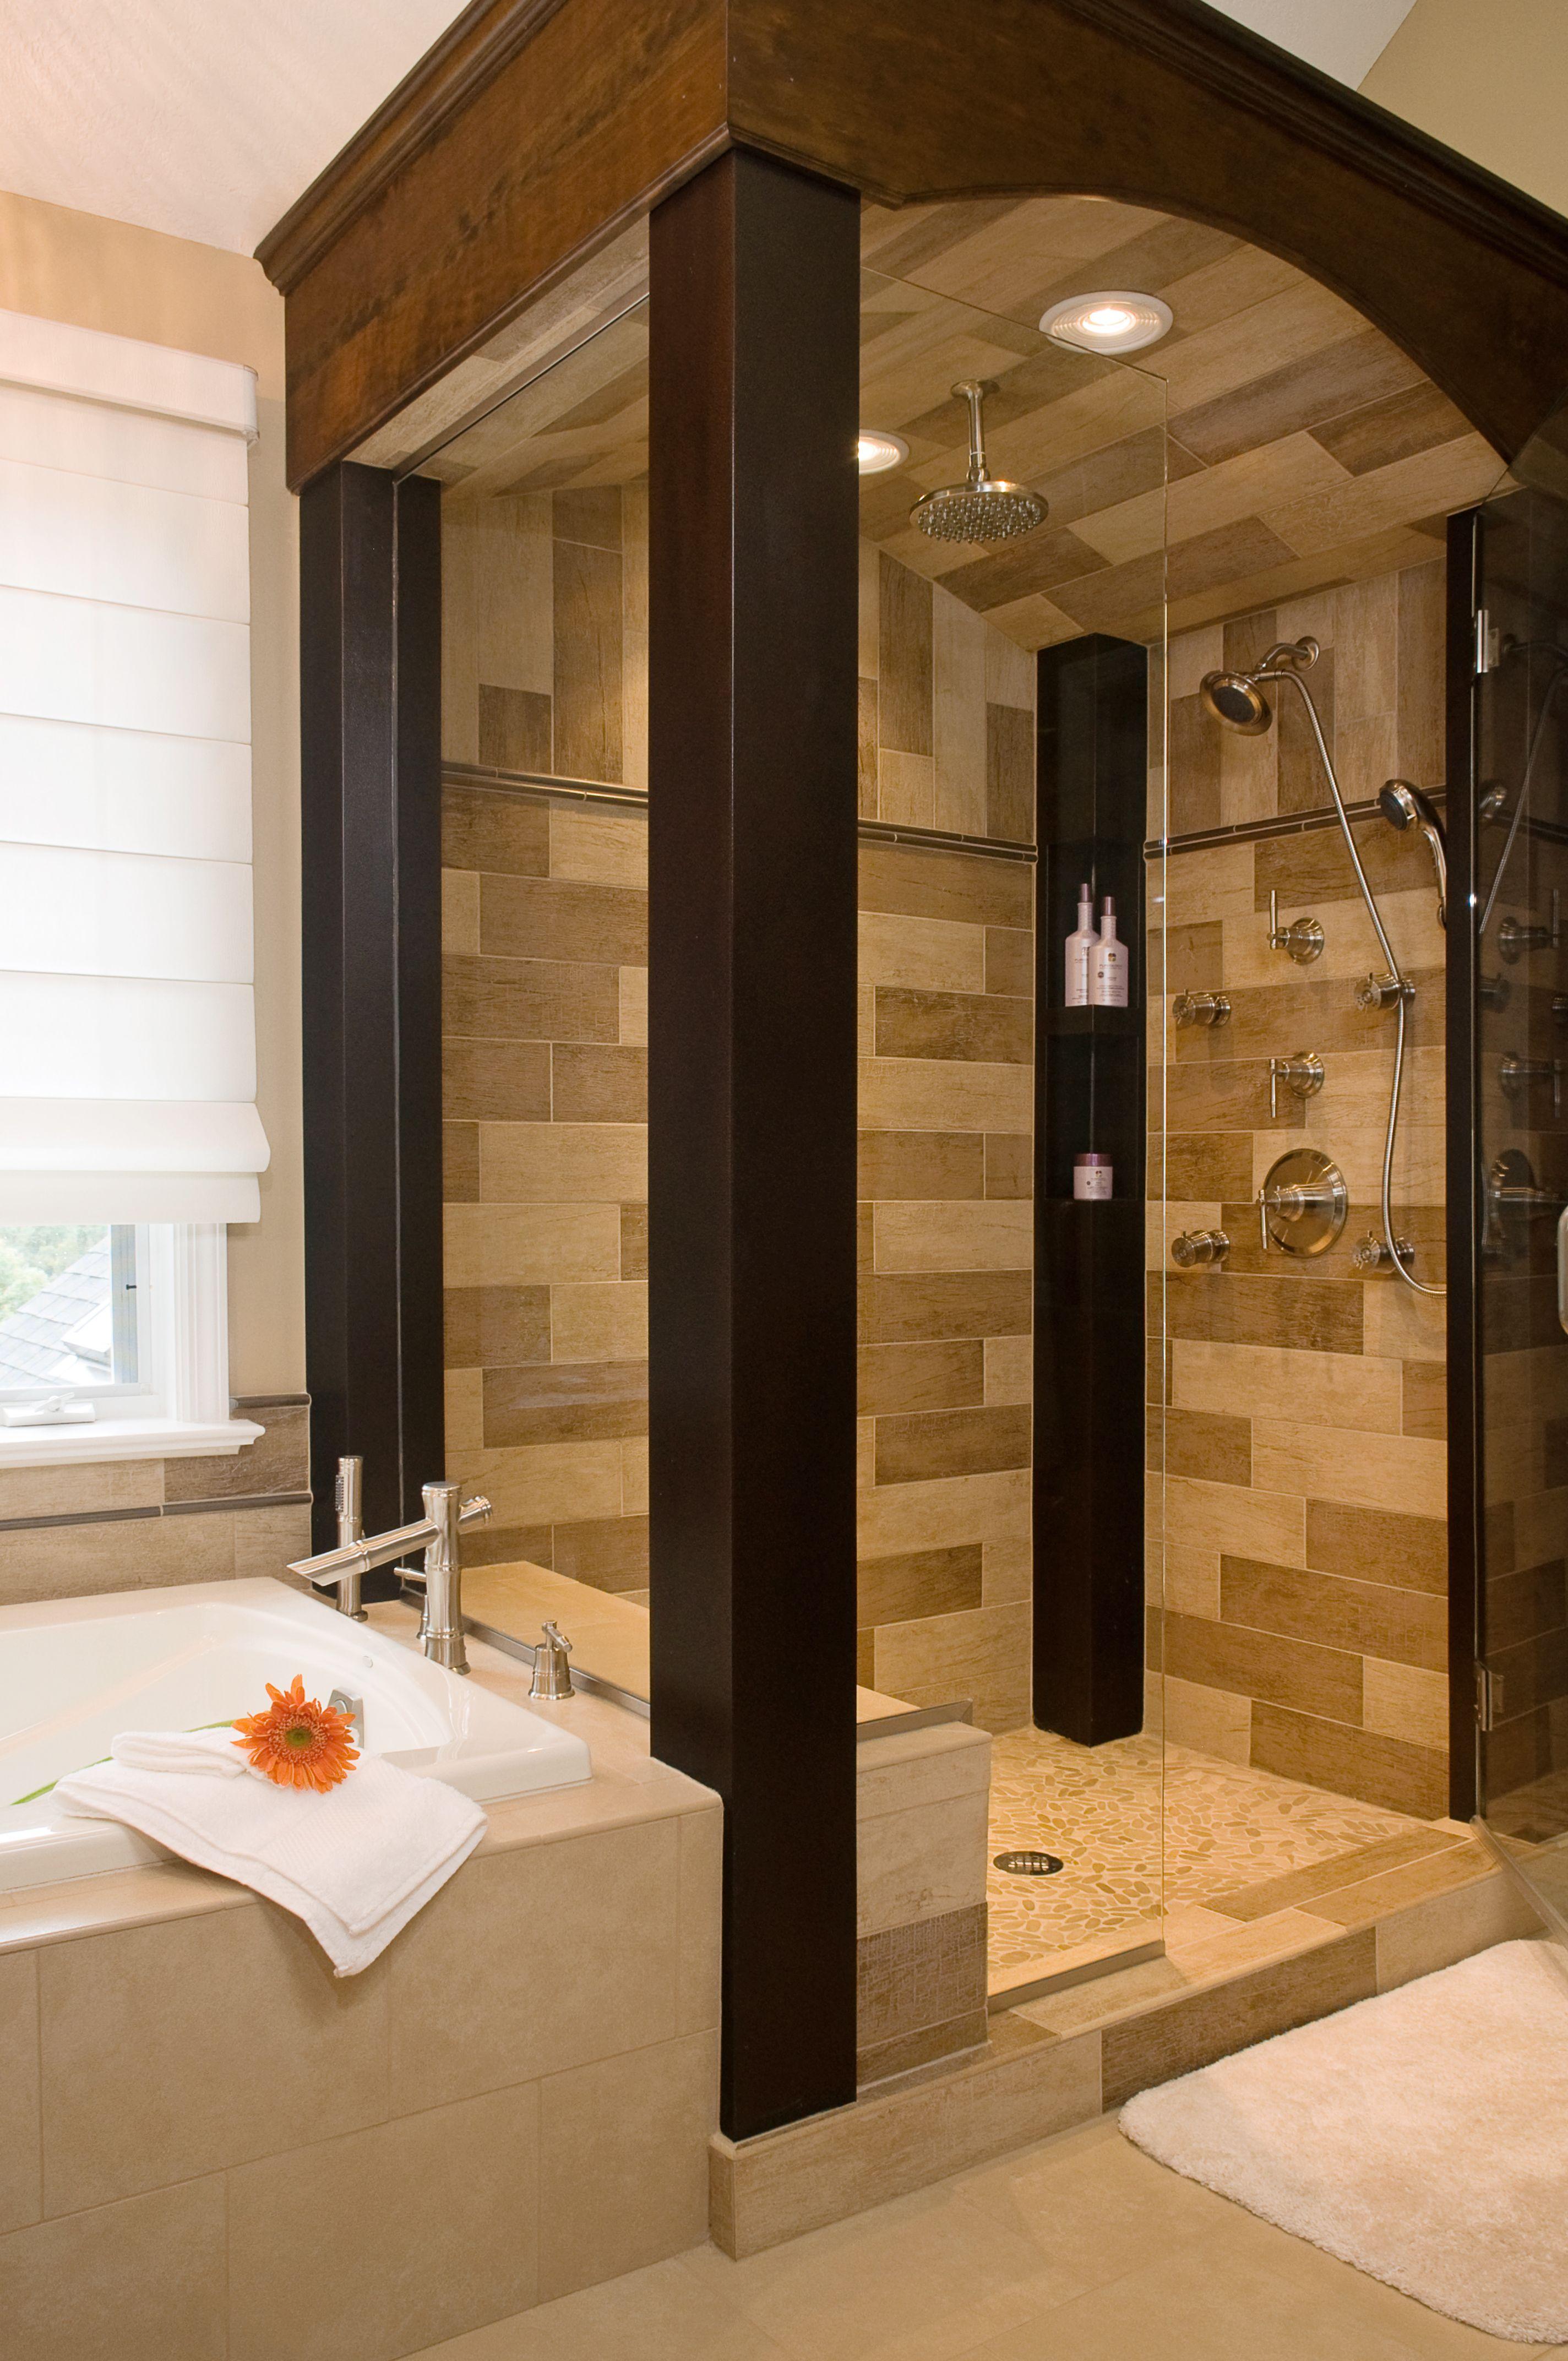 Beautiful Master Bathrooms Exterior beautiful custom design on a walk-in shower. metal columns